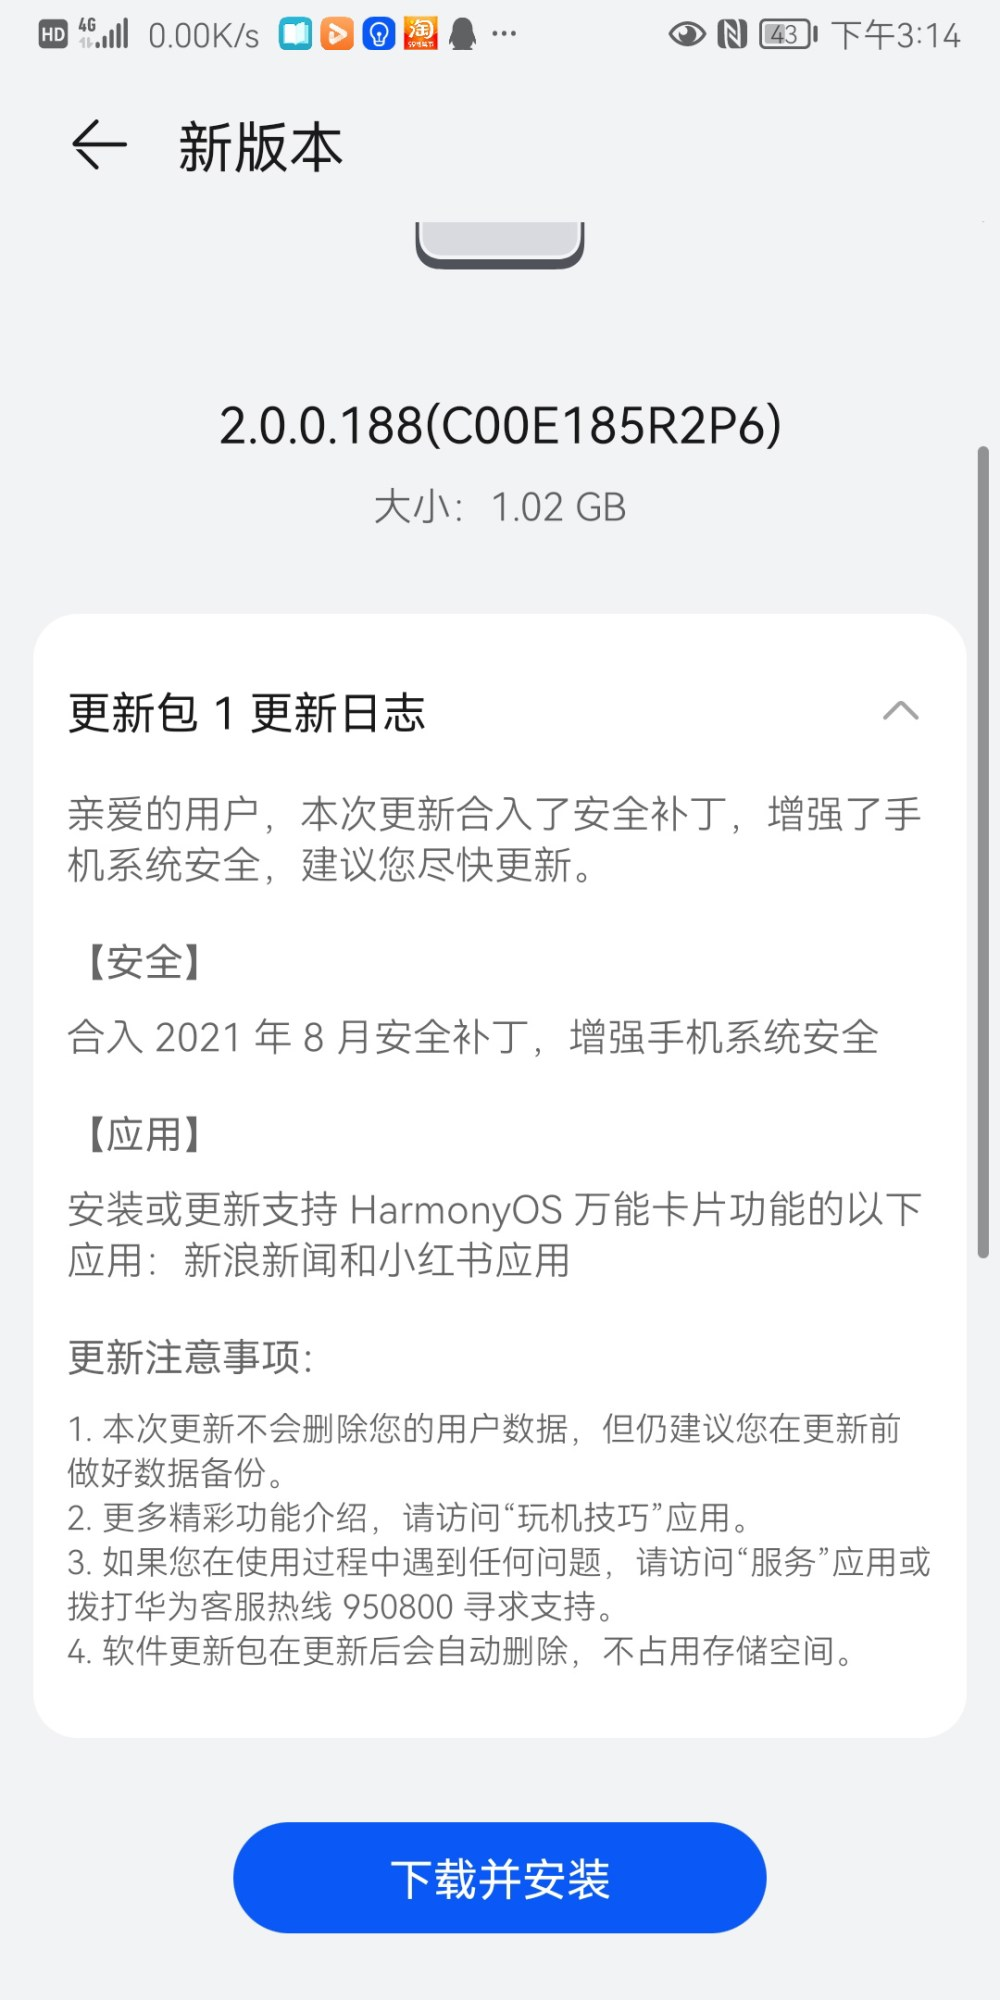 Honor V10 HarmonyOS 2.0.0.188